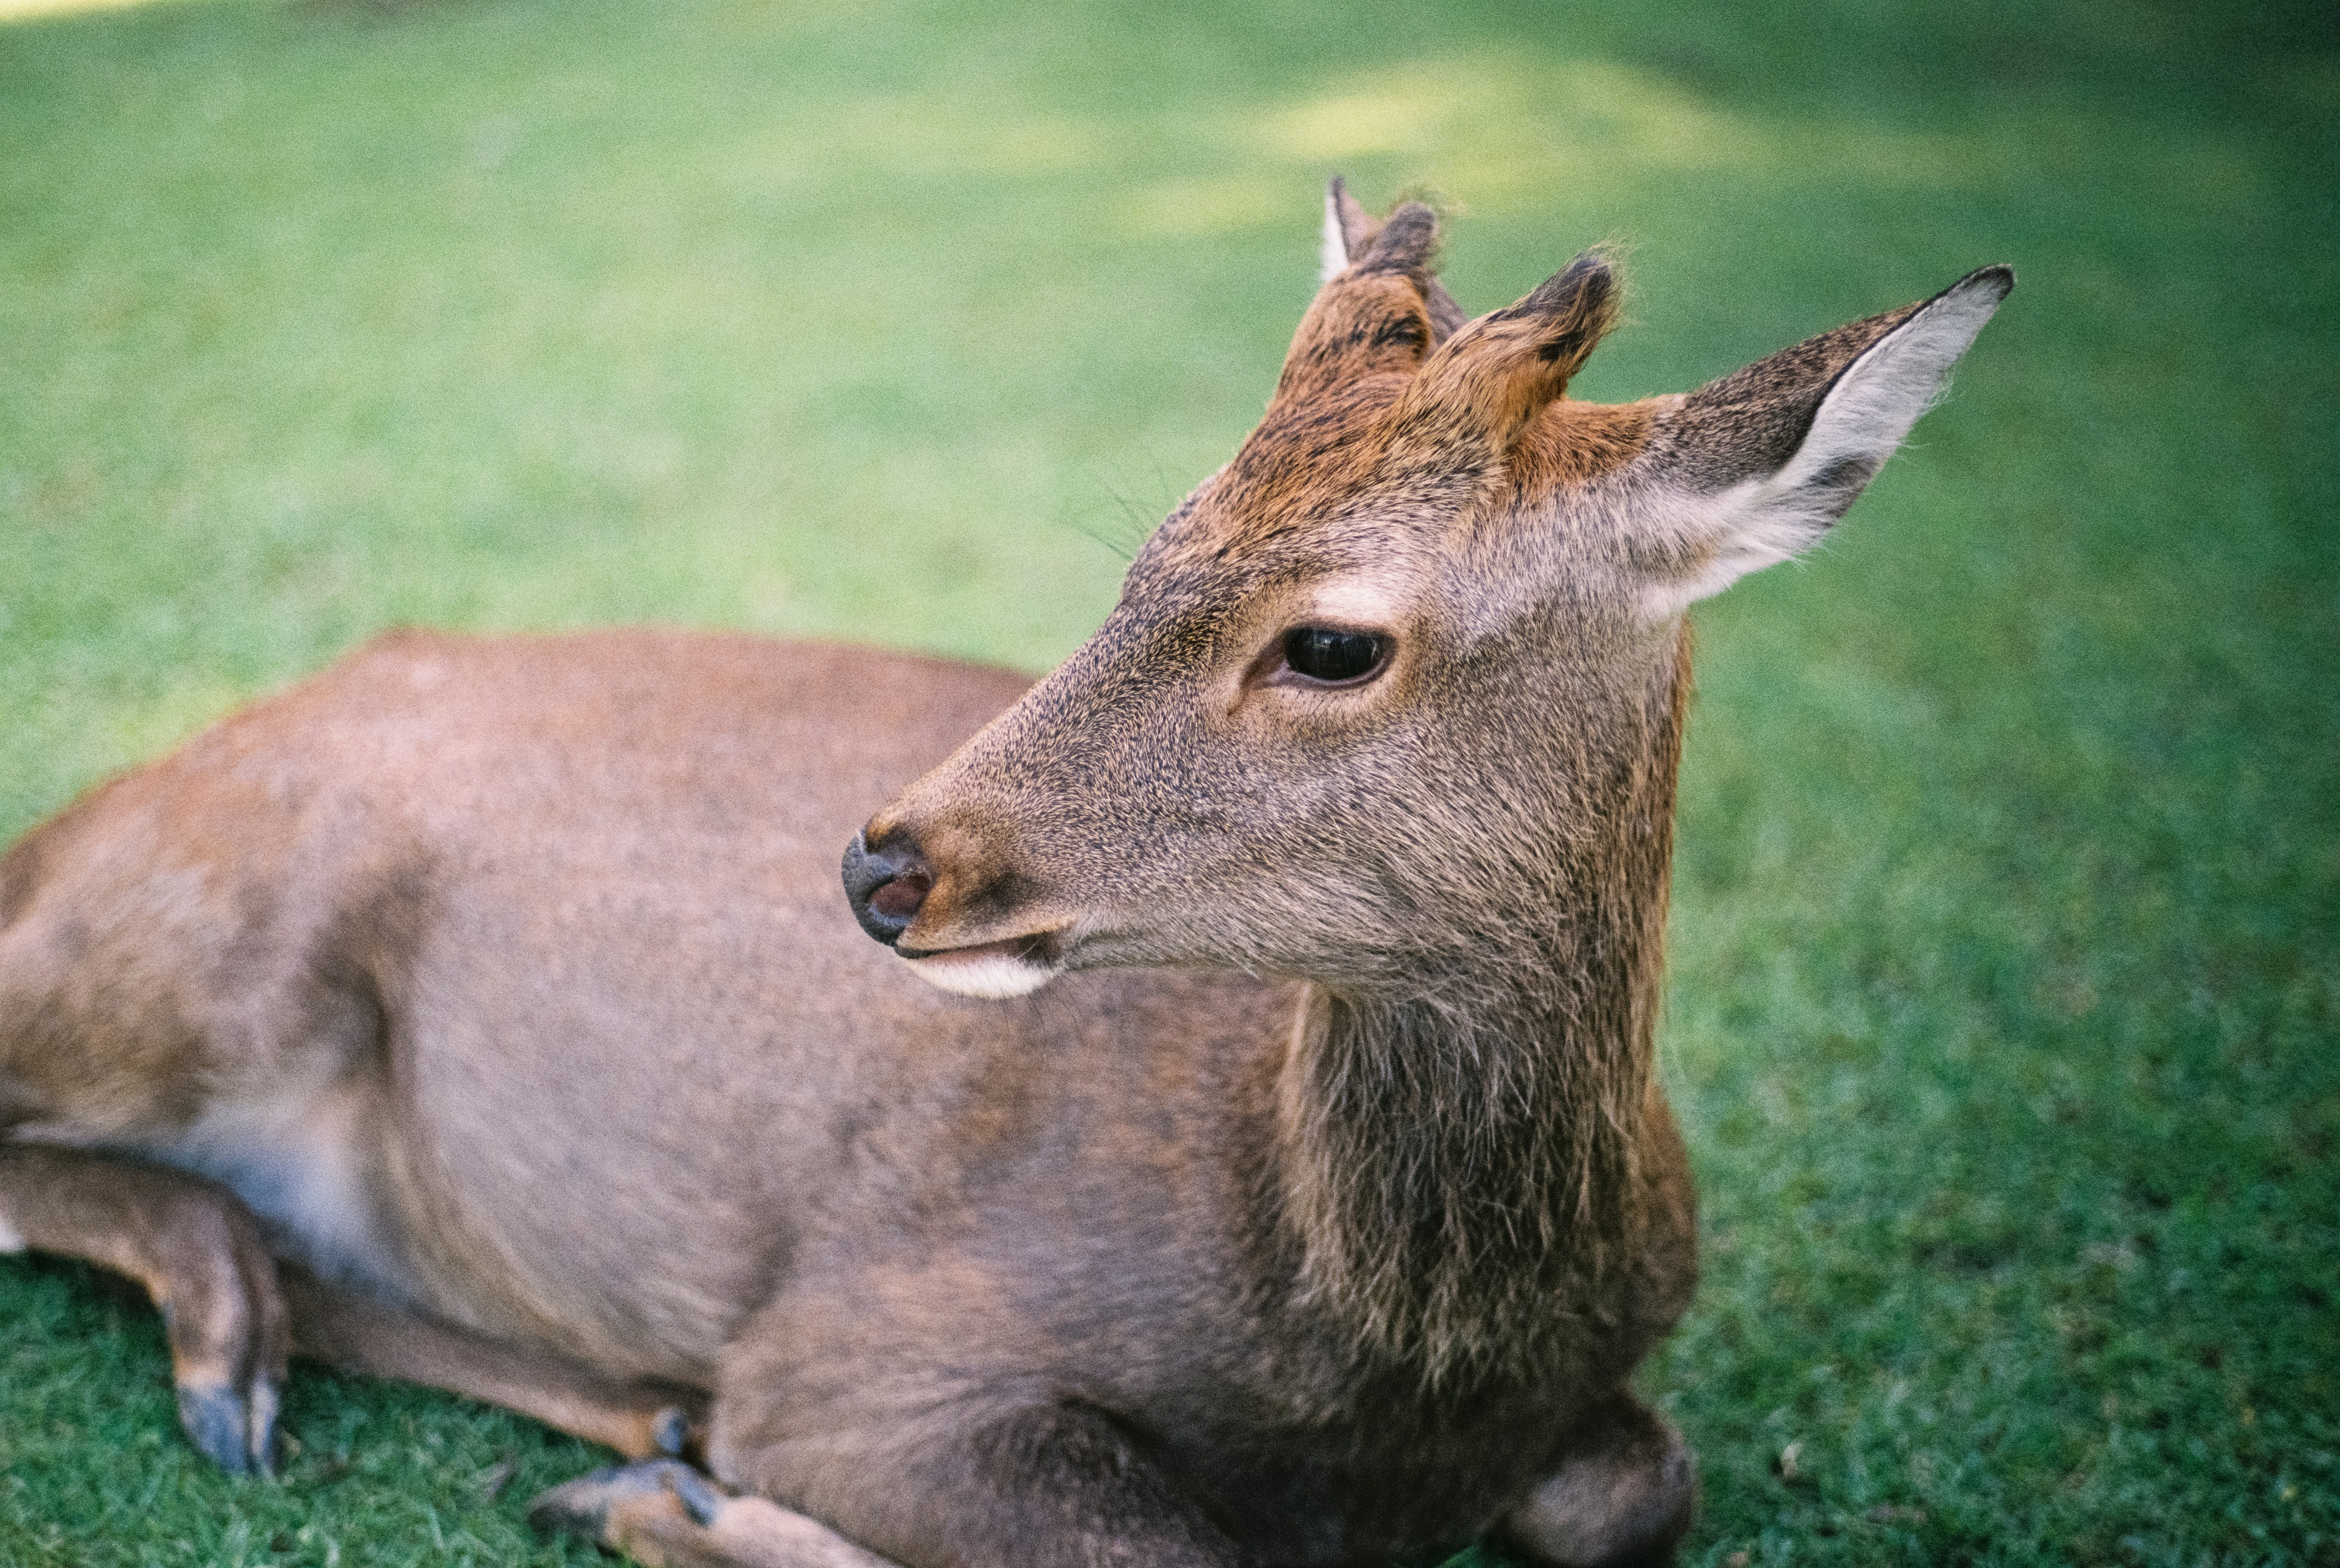 deer lying on lawn during daytime